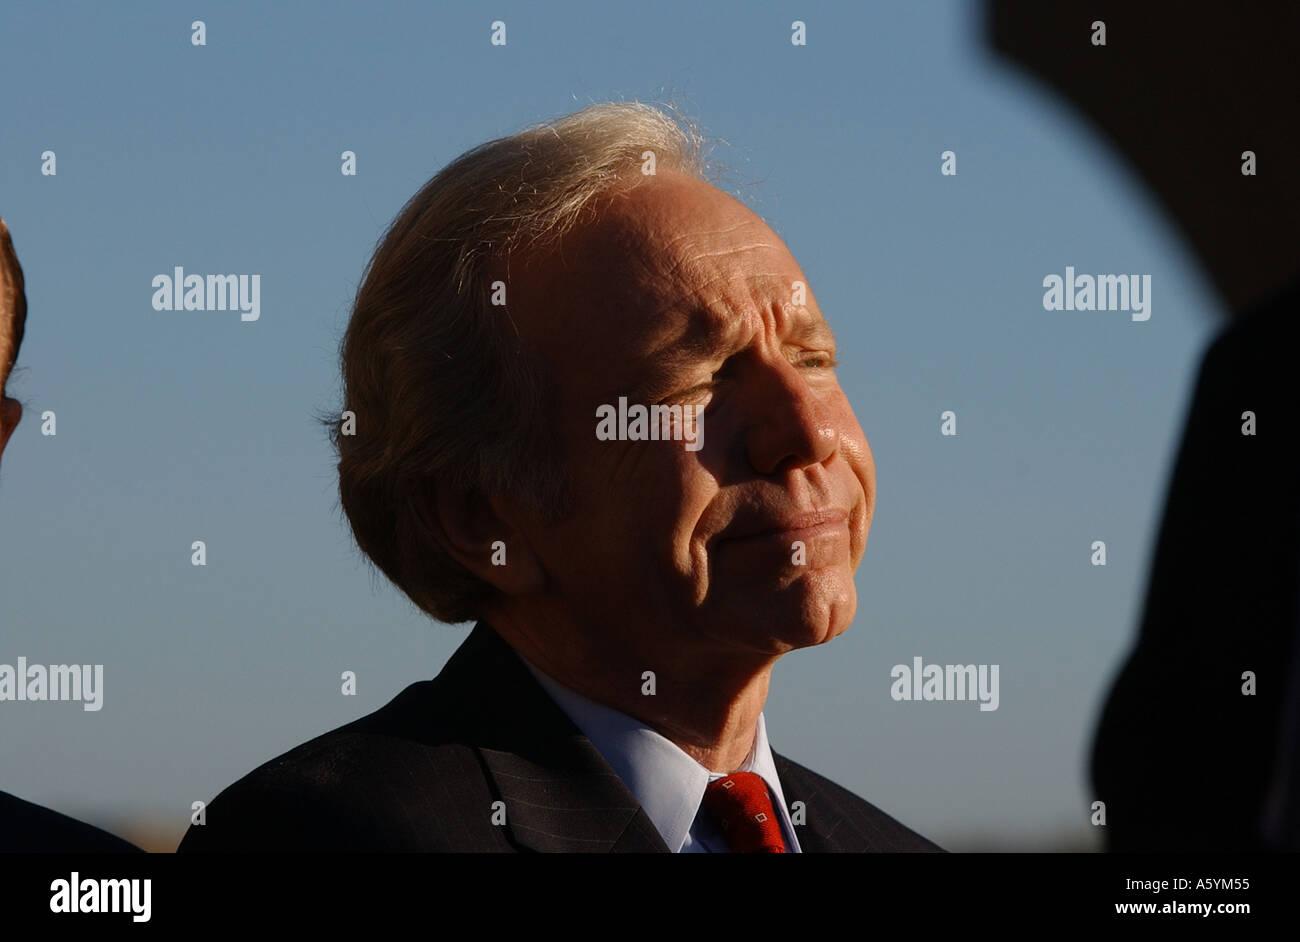 Senator Joe Lieberman campaigns for the US Presidency in 2004 - Stock Image